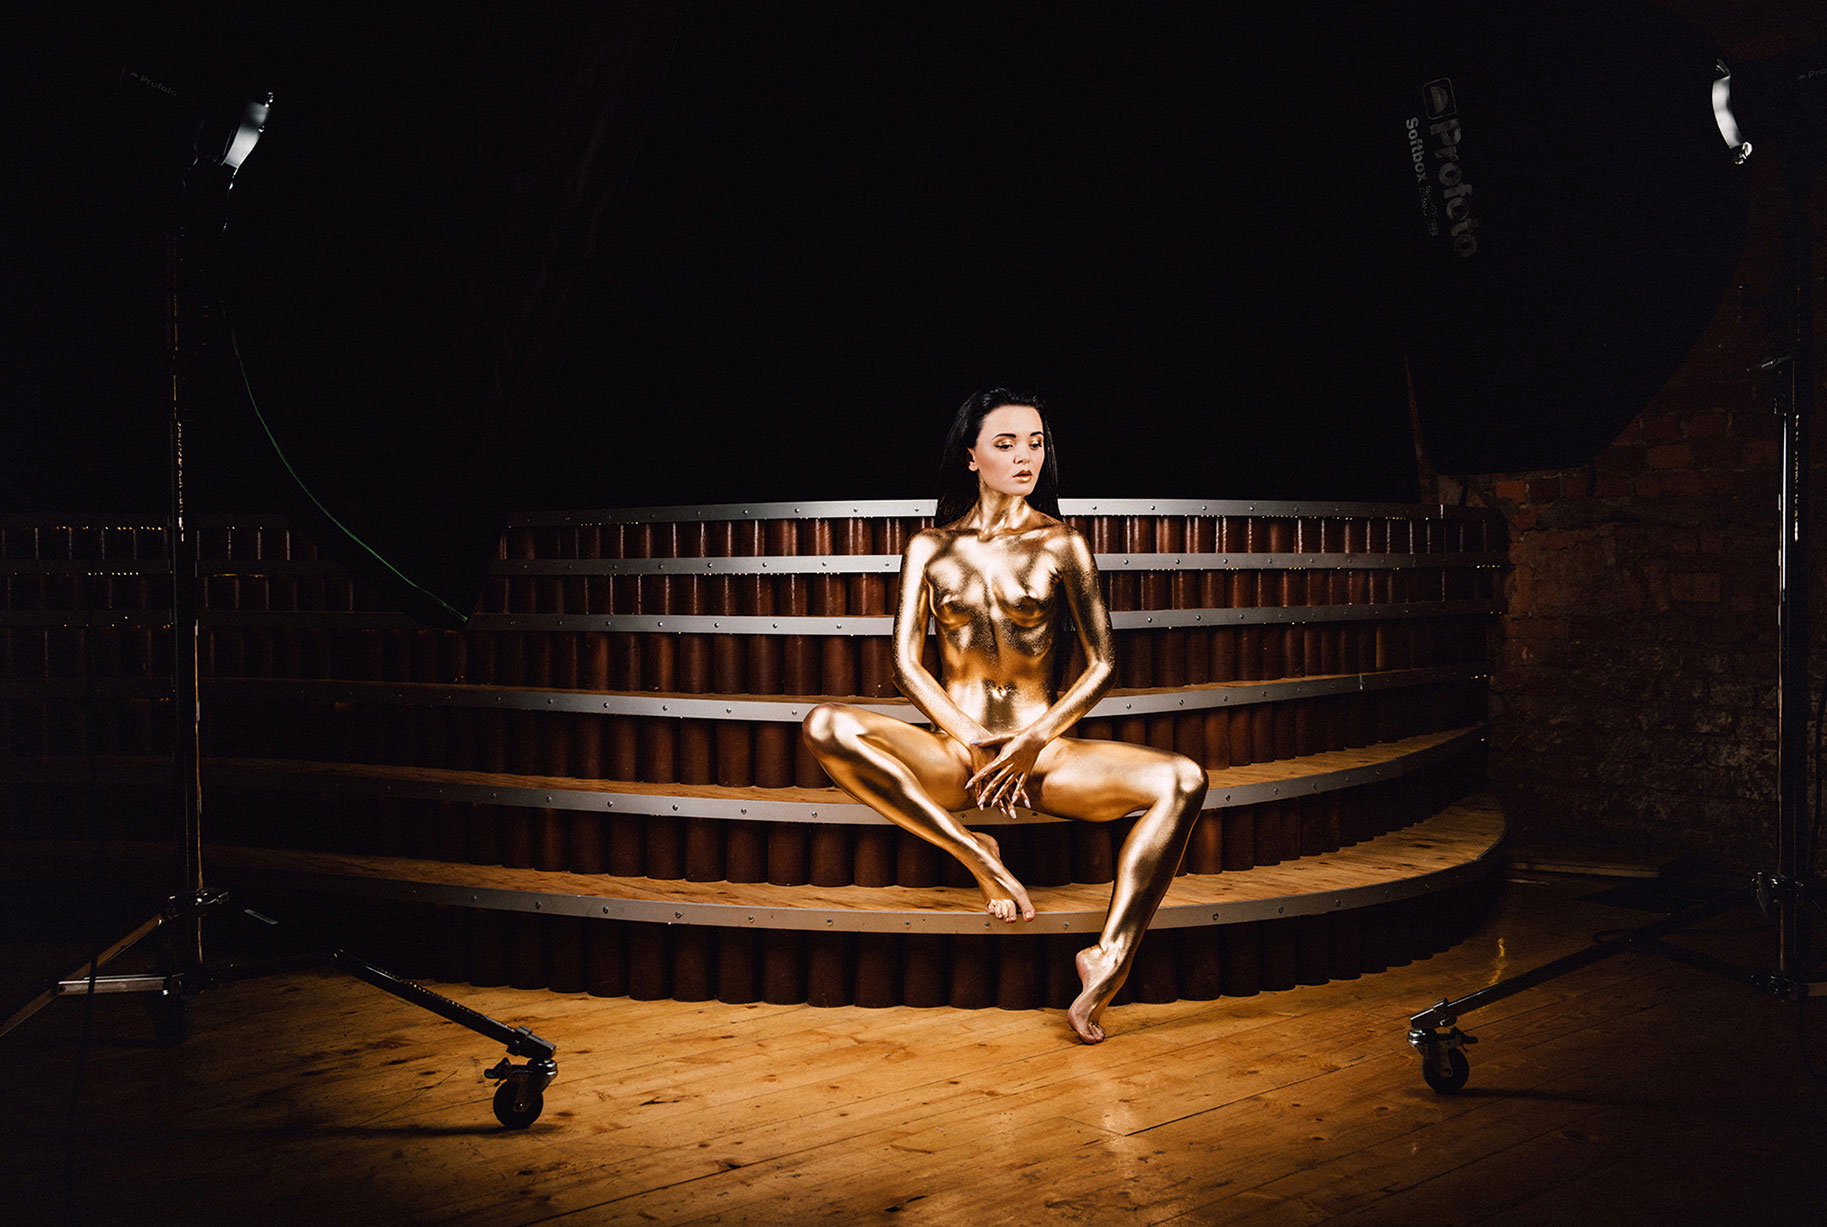 Goldy / Золотая девушка / Алина Бош, фотограф Роман Третьяков